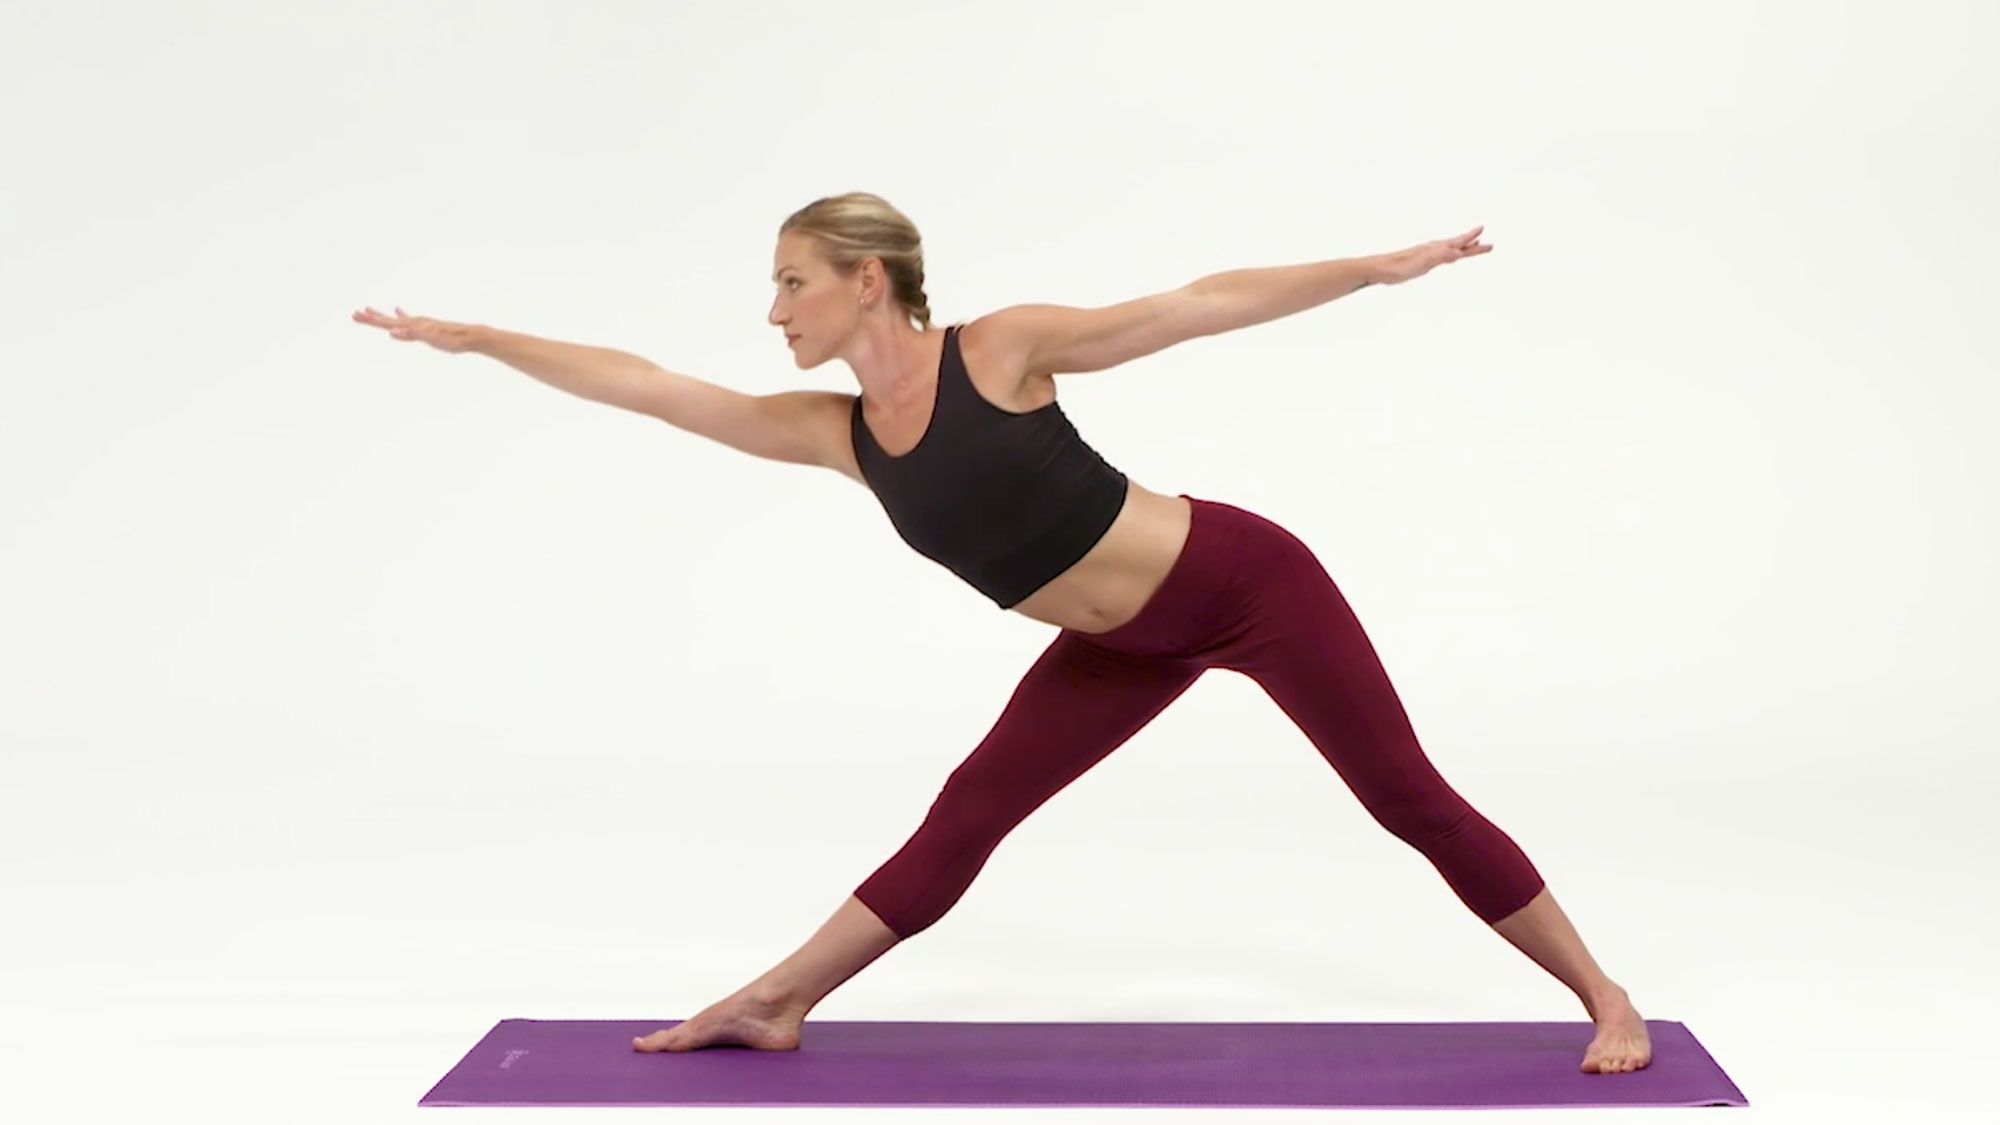 Best yoga mats: Gaiam Premium 2-Color Yoga Mat